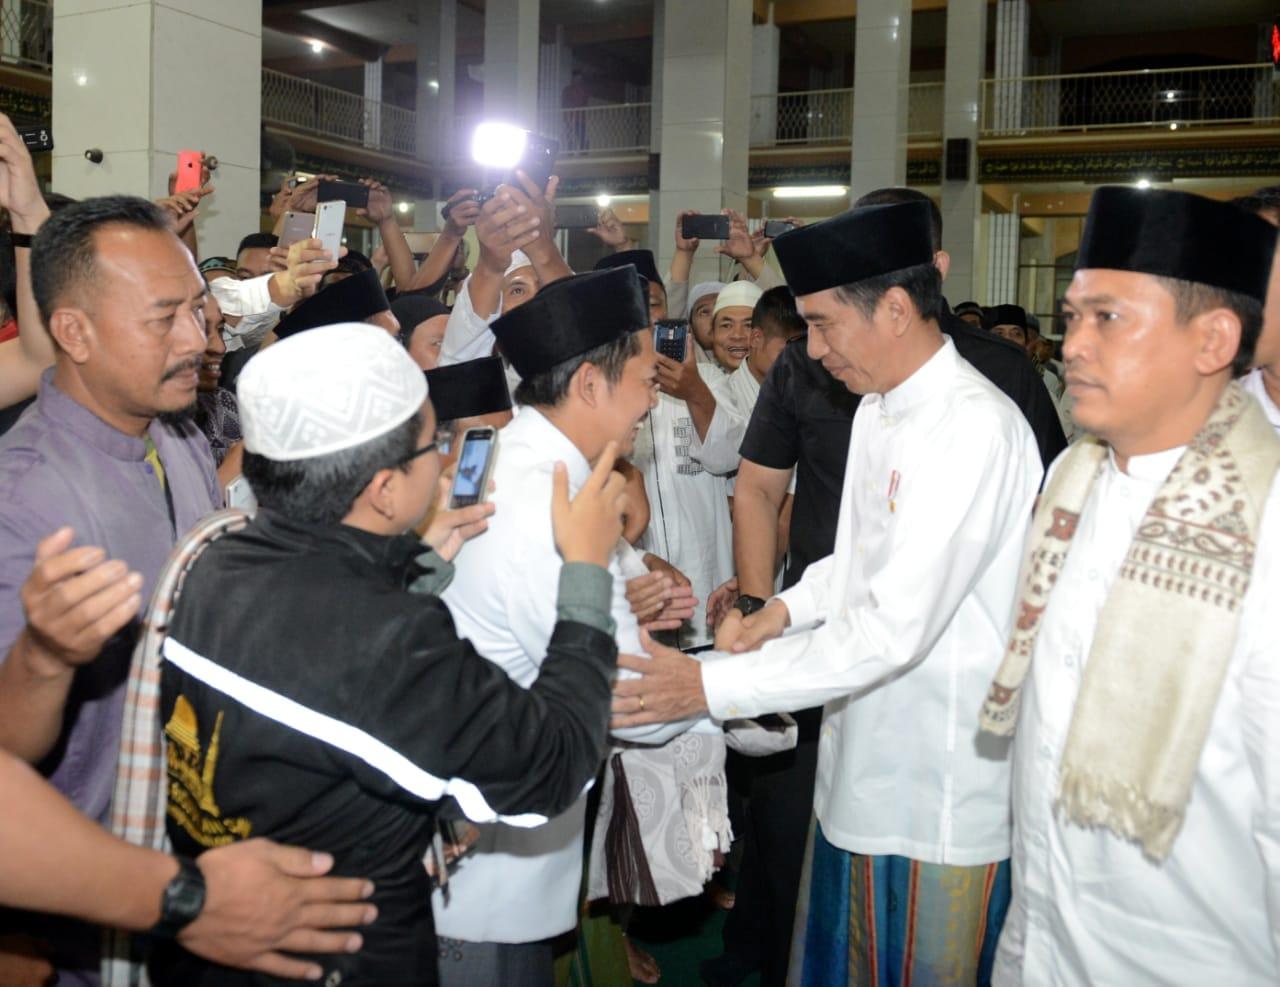 presiden-salat-tarawih-bersama-masyarakat-kuningan-8